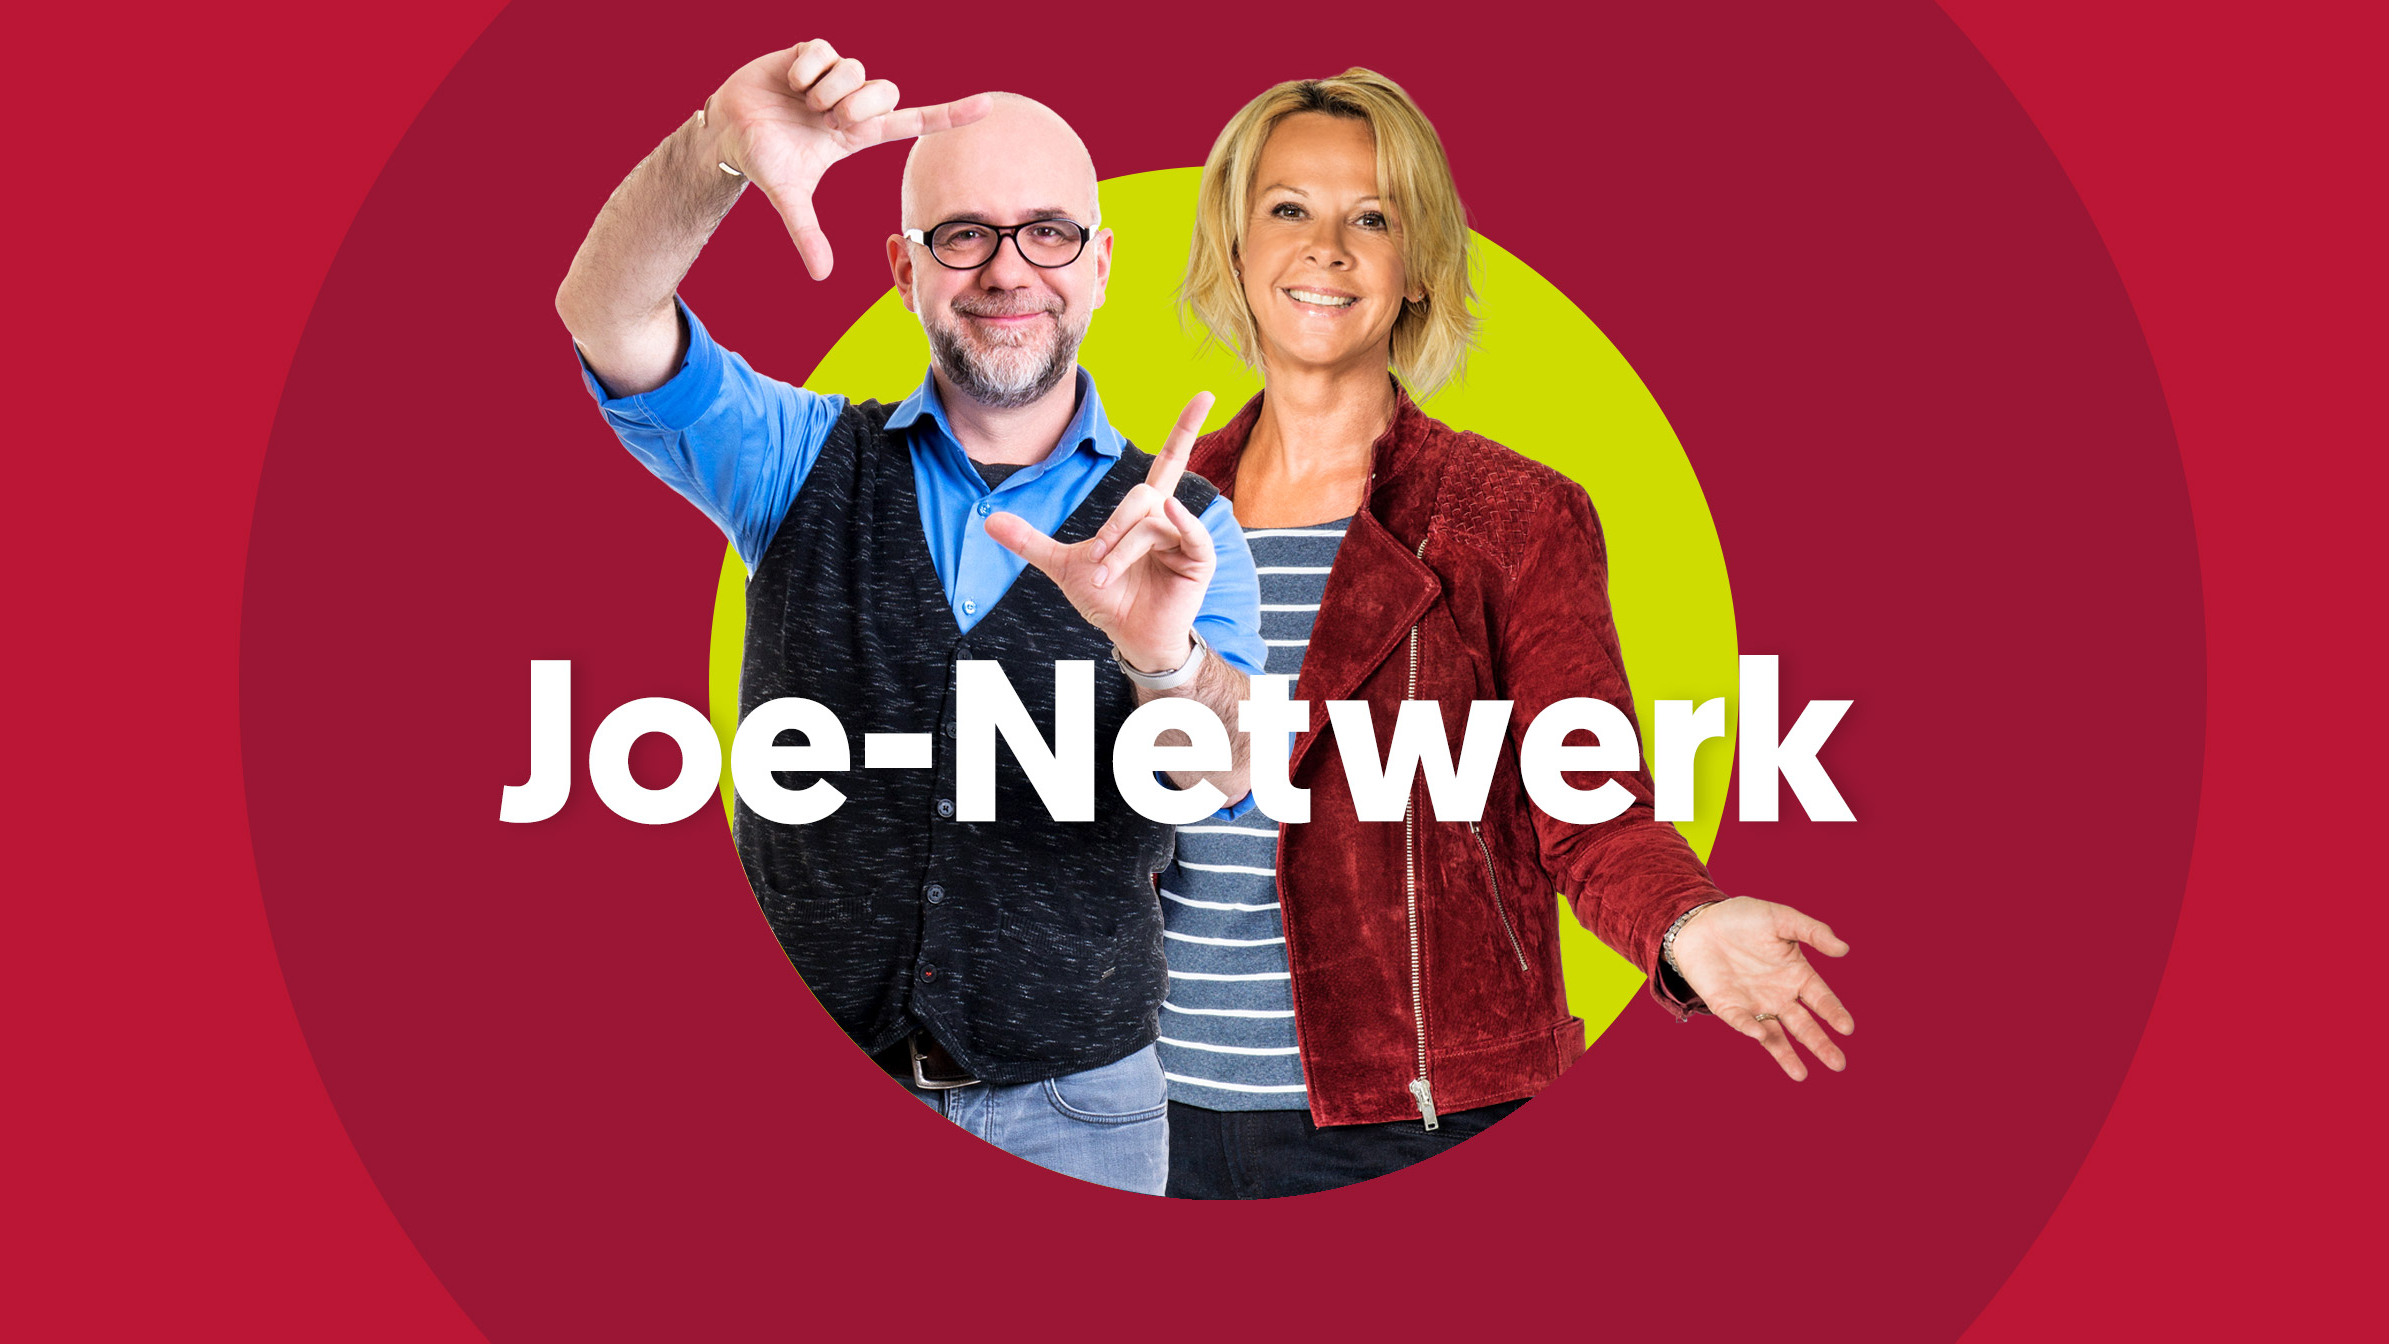 Joe netwerk